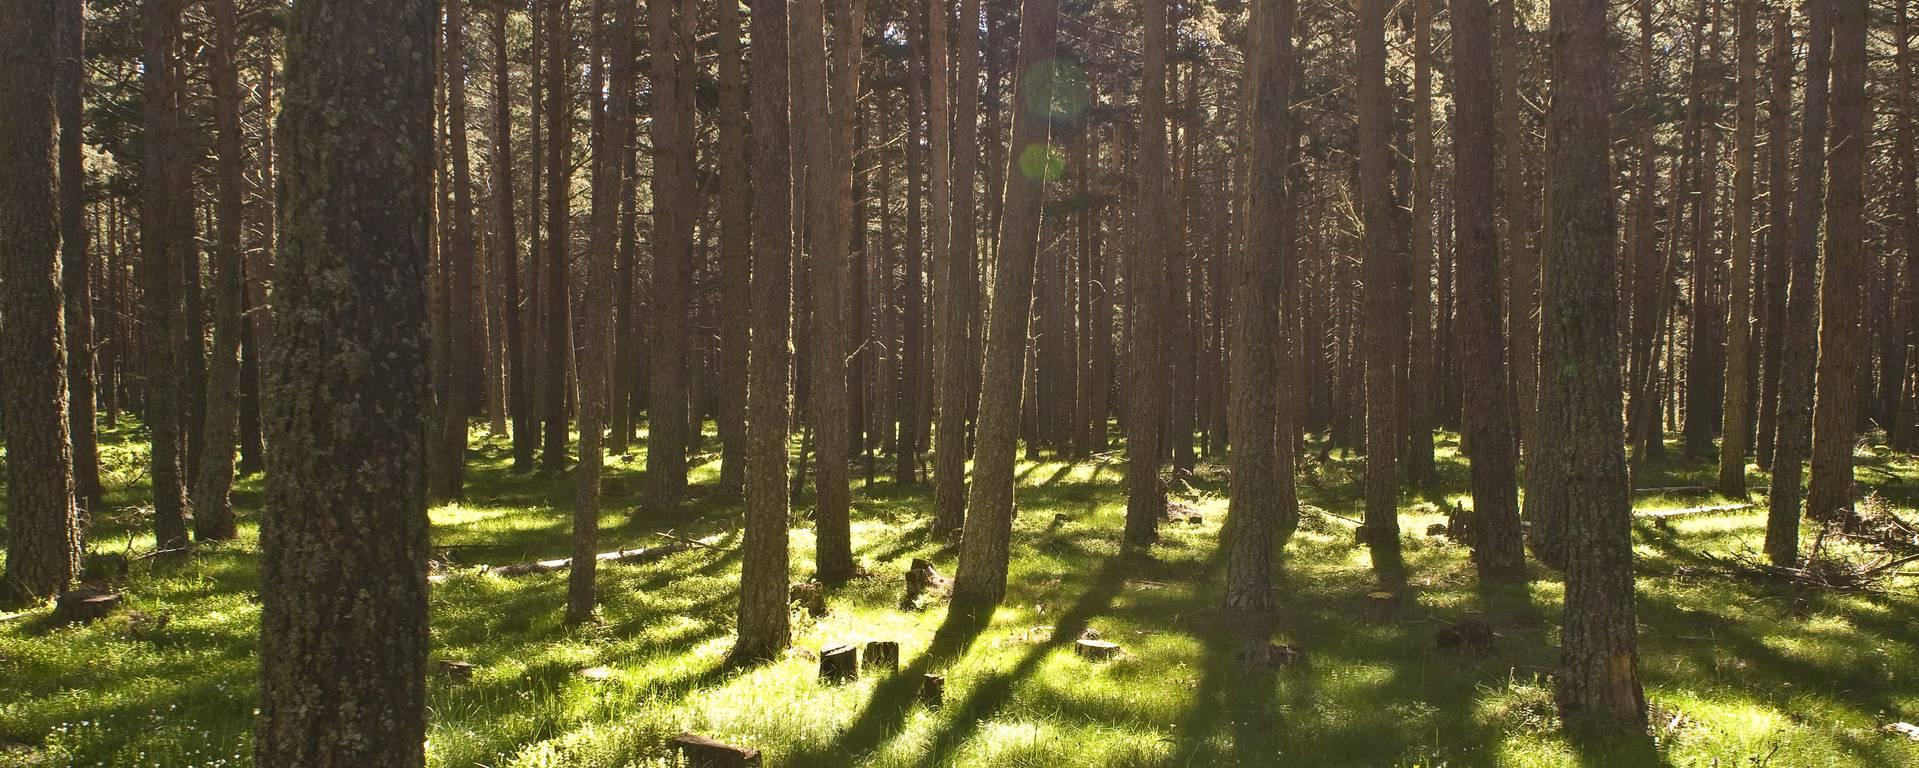 En forêt © S. burkhardt